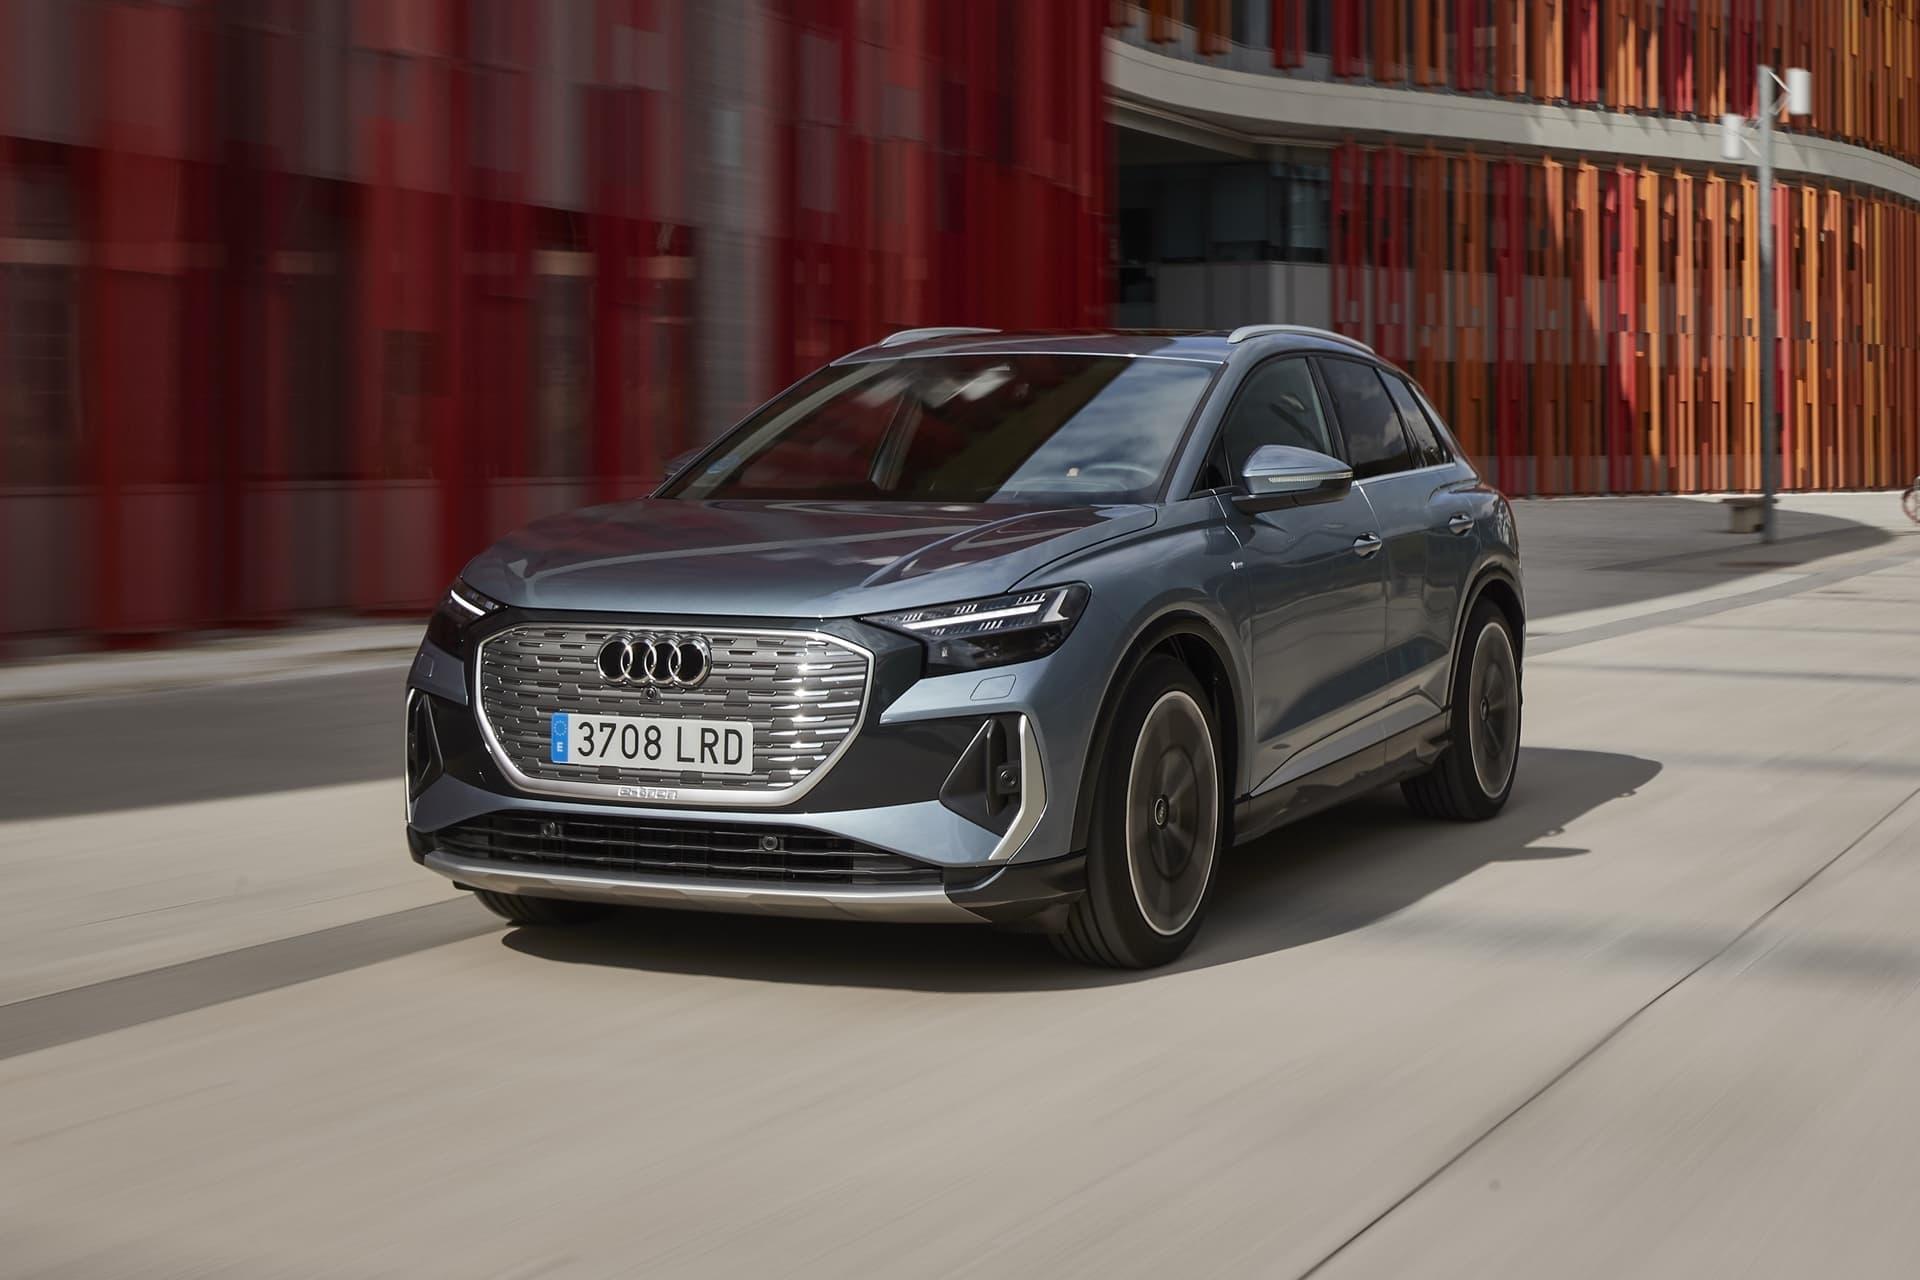 Audi Q4 E Tron 2021 0721 021